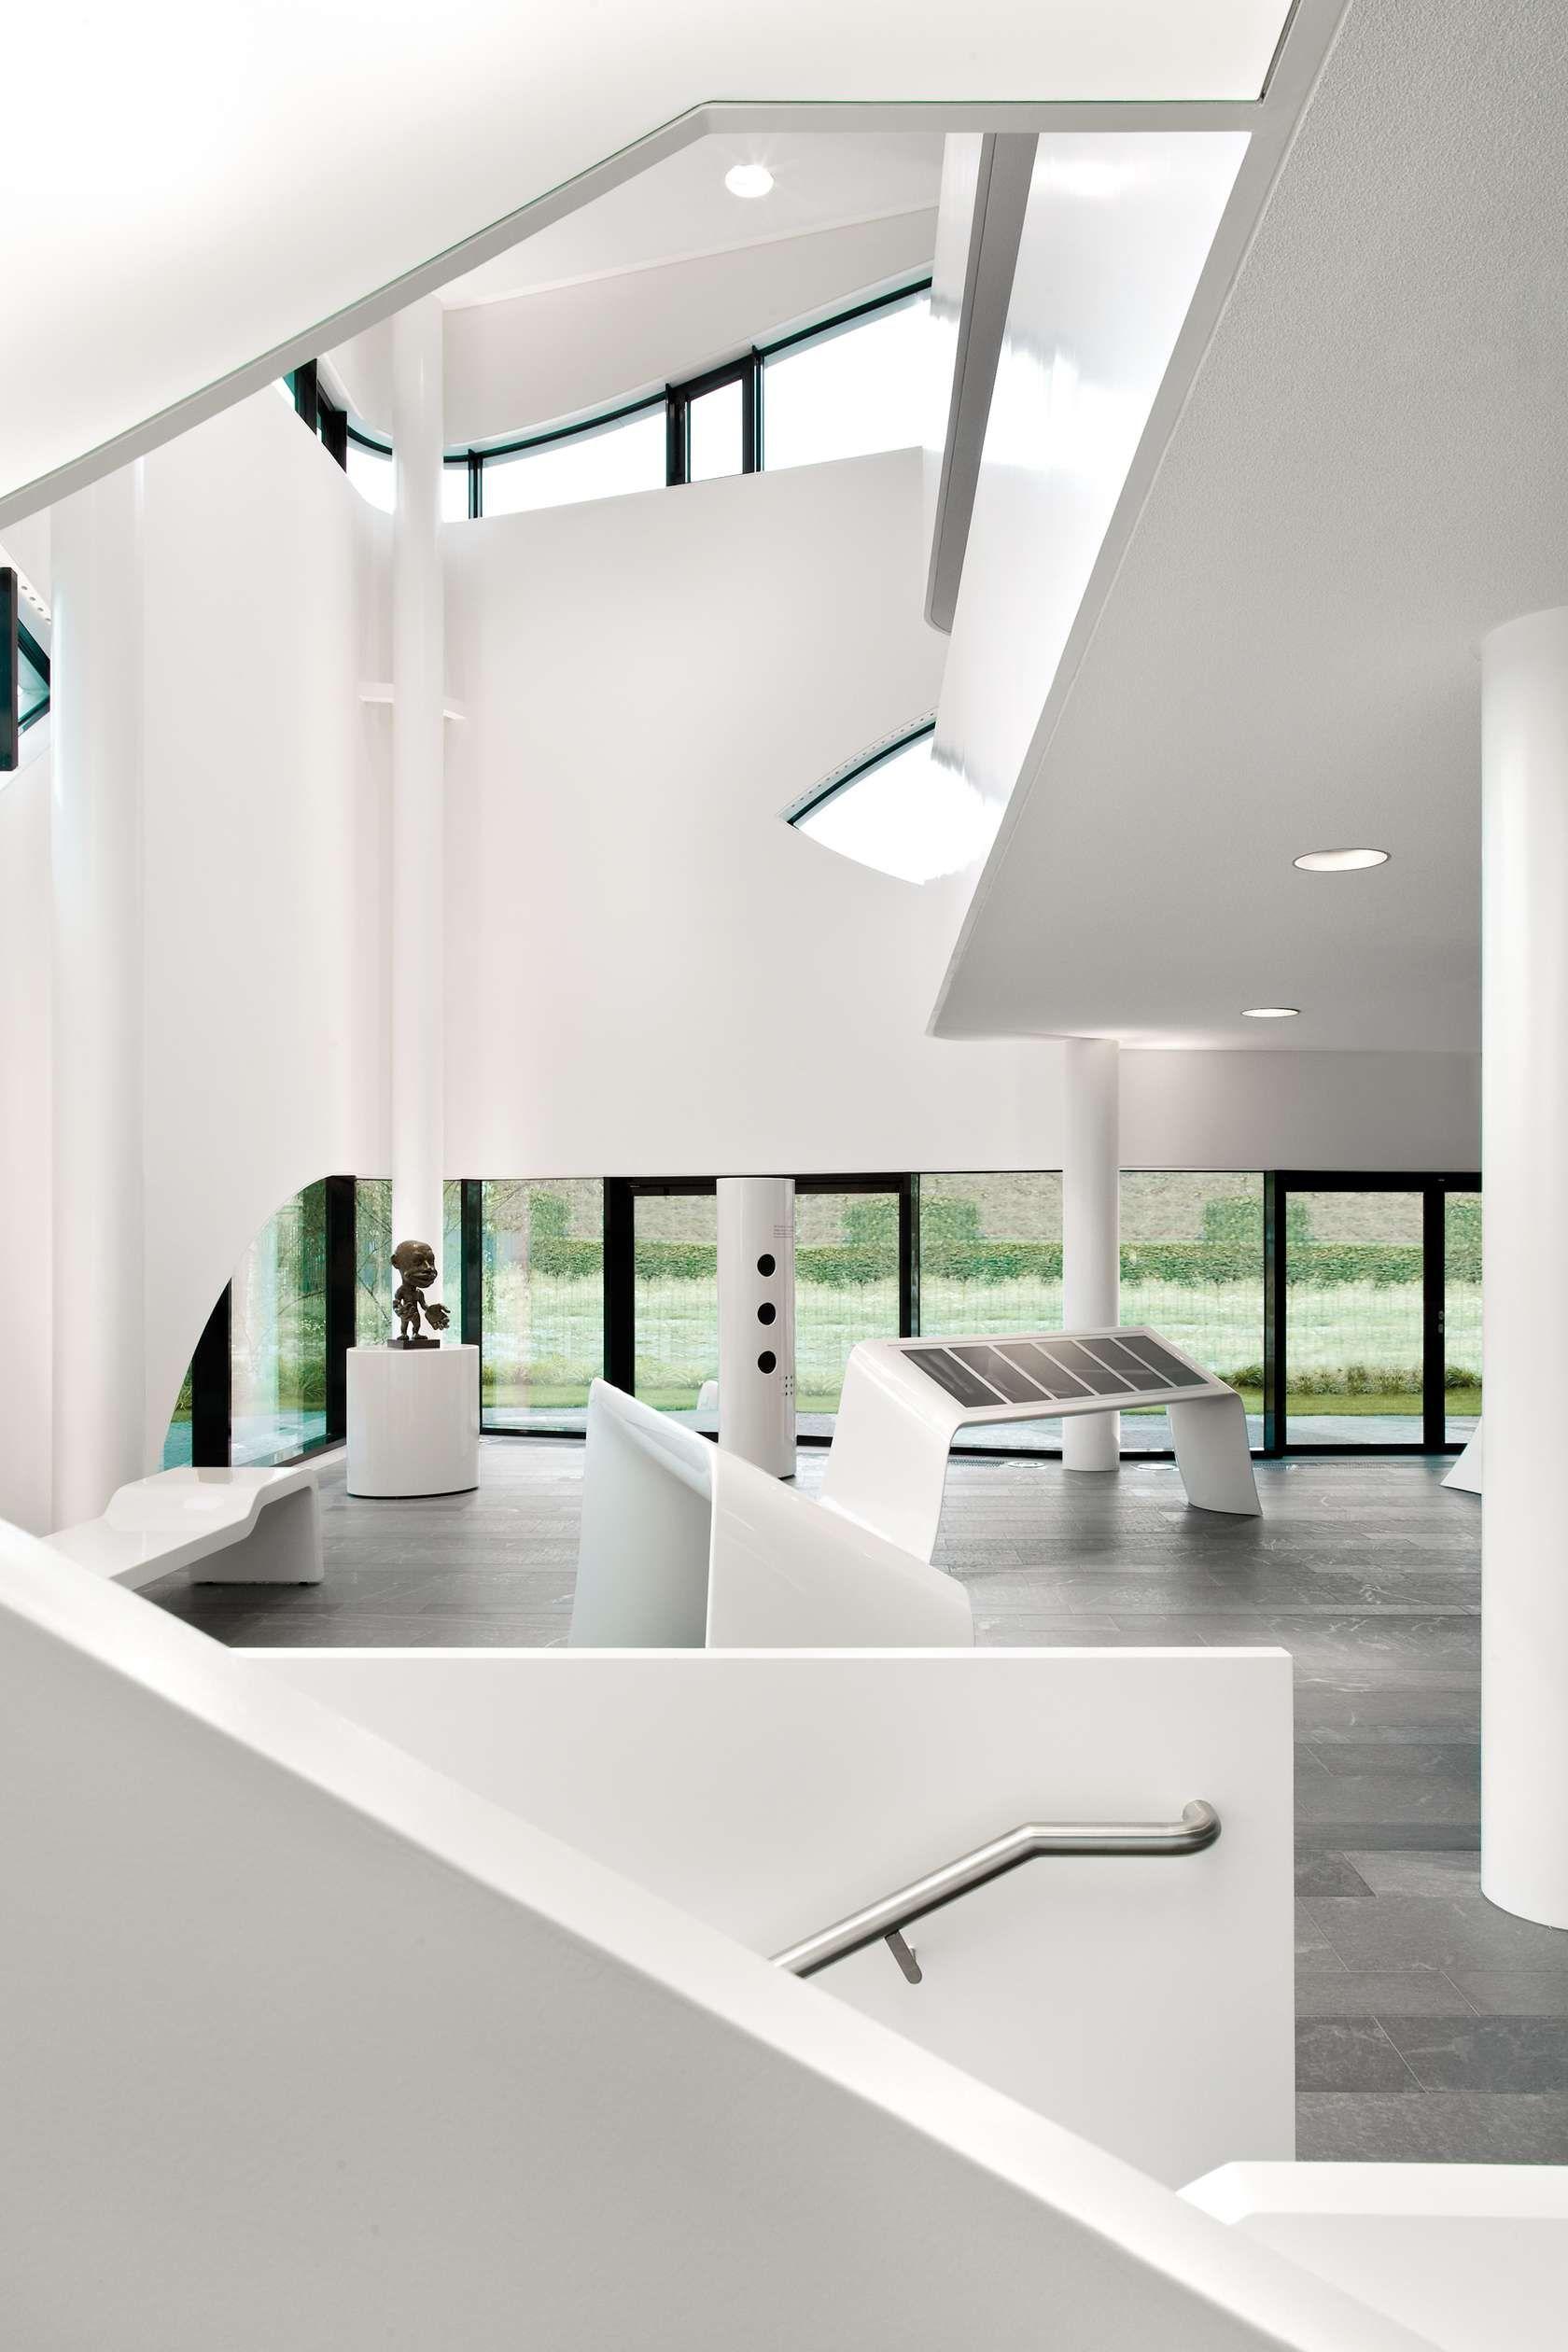 Science Center Otto Bock on Architizer | Residence | Pinterest ...